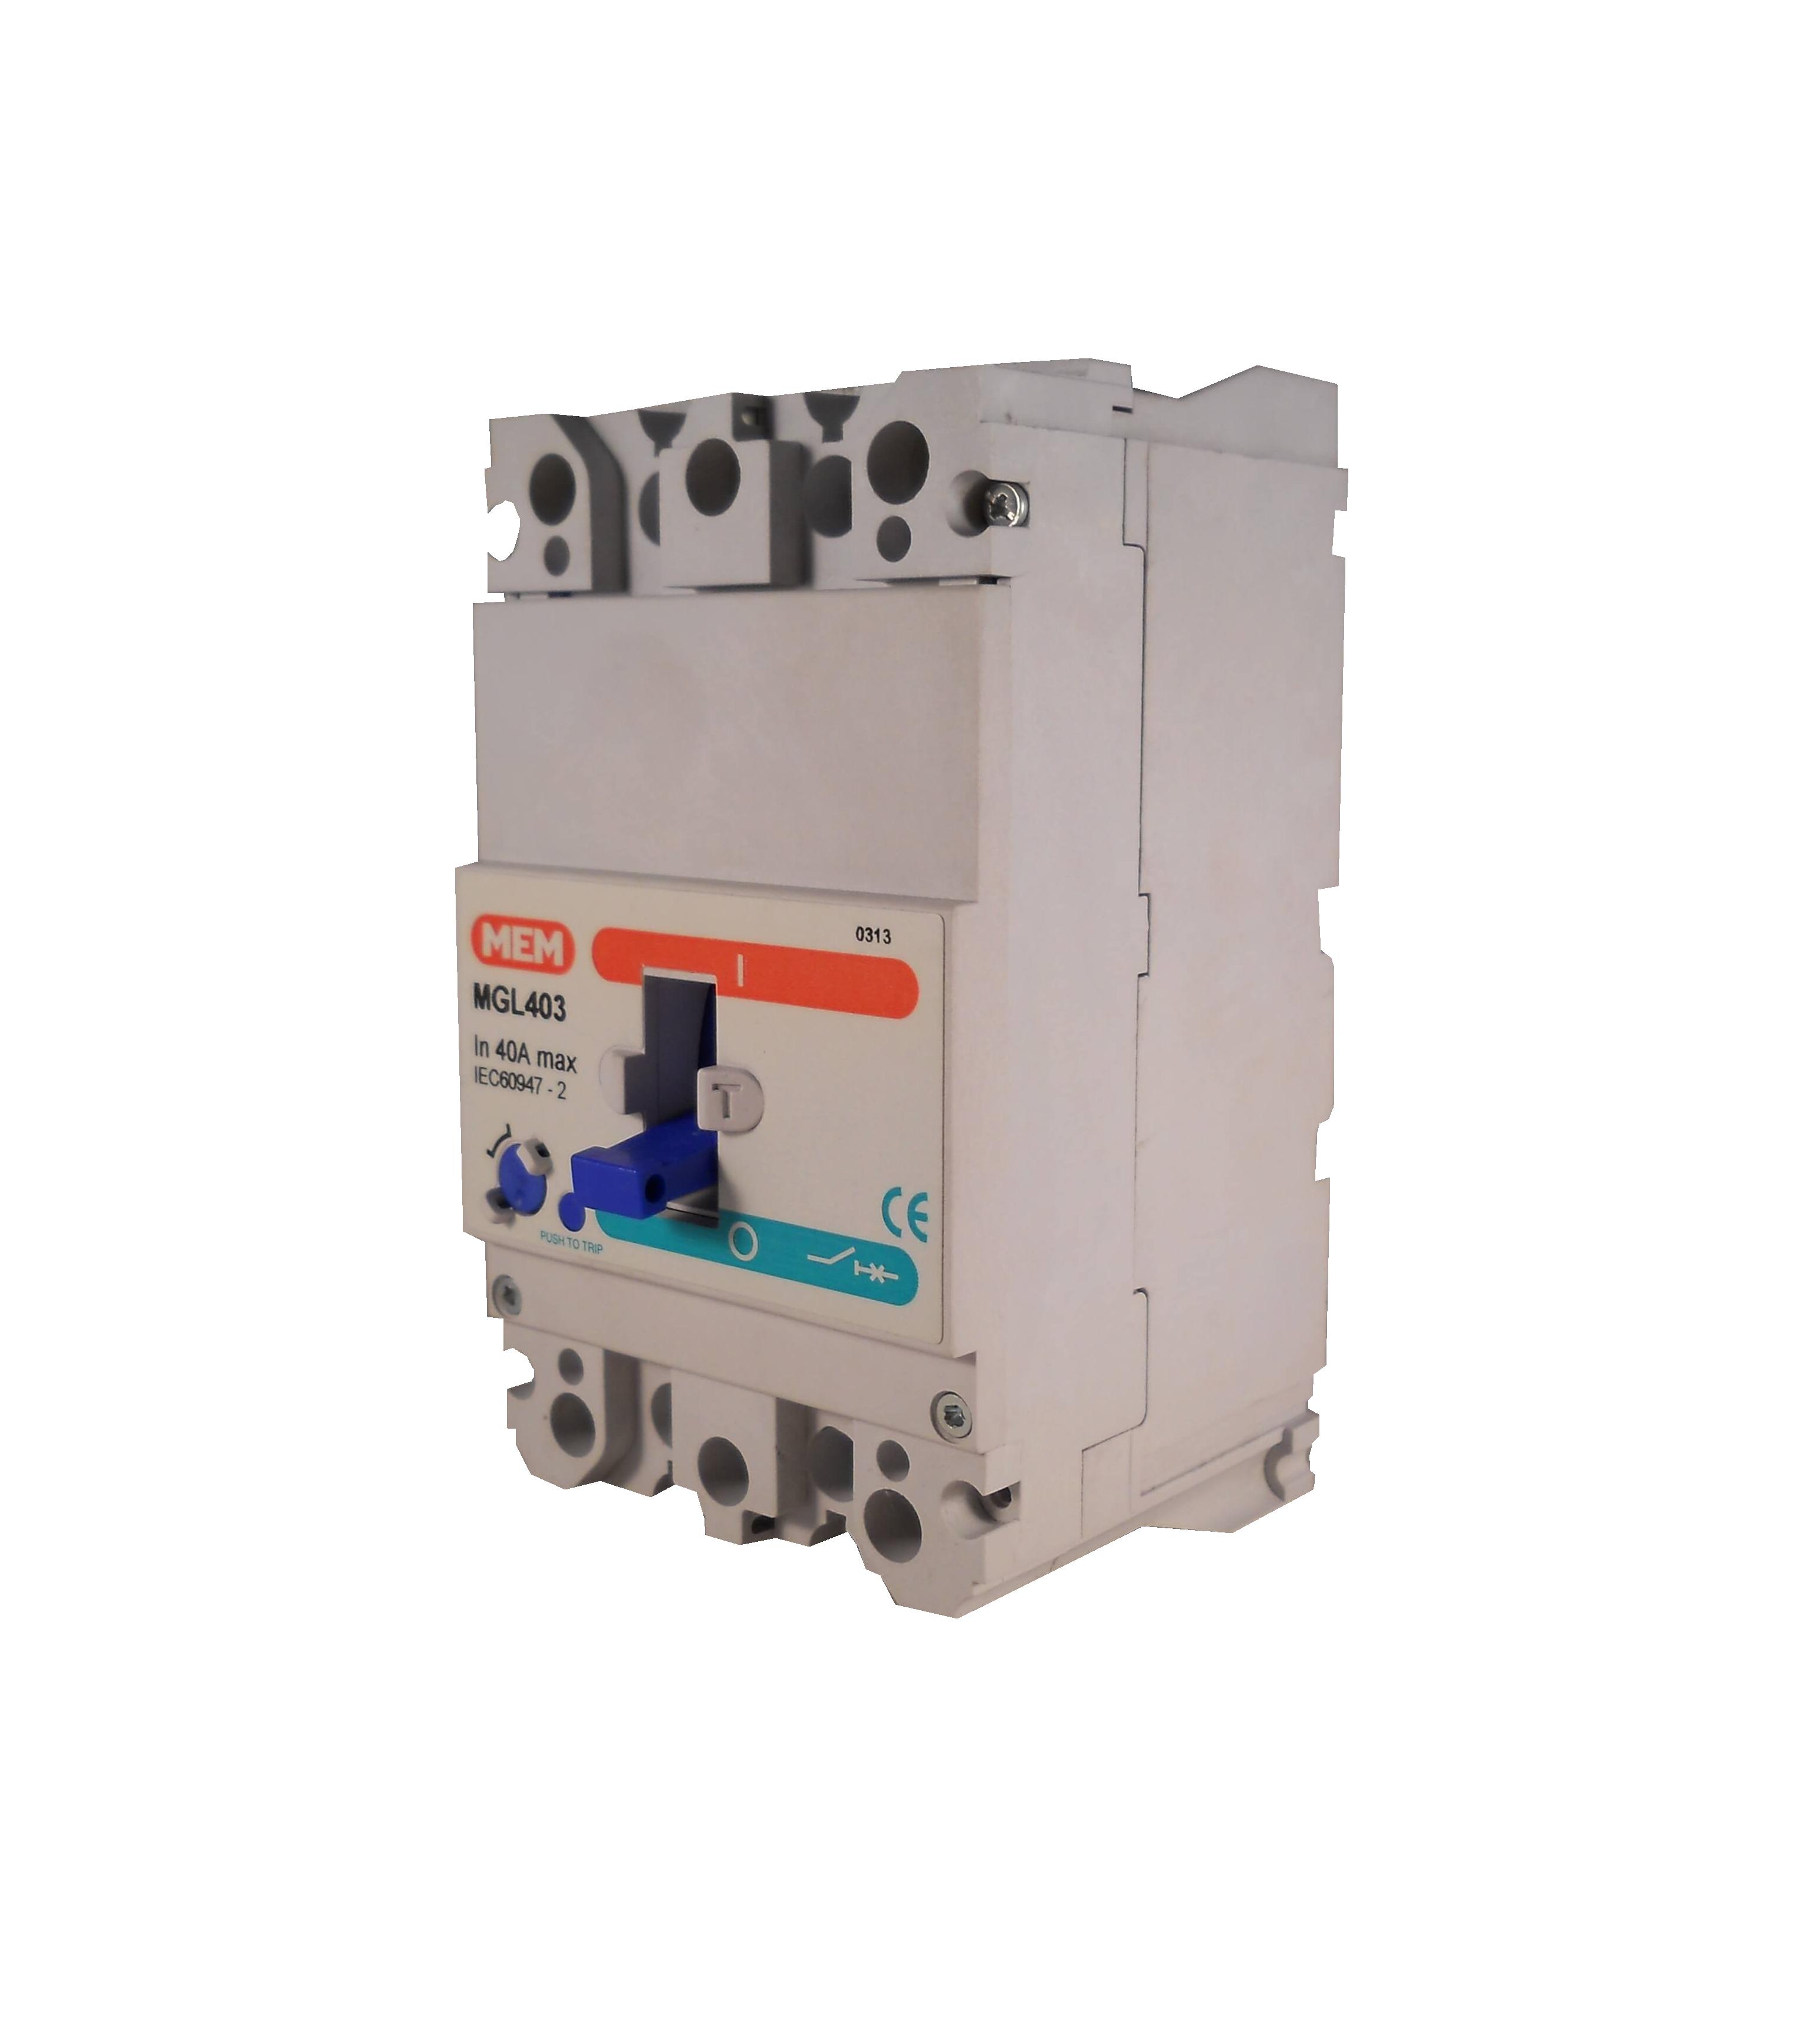 Kelvelec Electrical Supplies Ltd